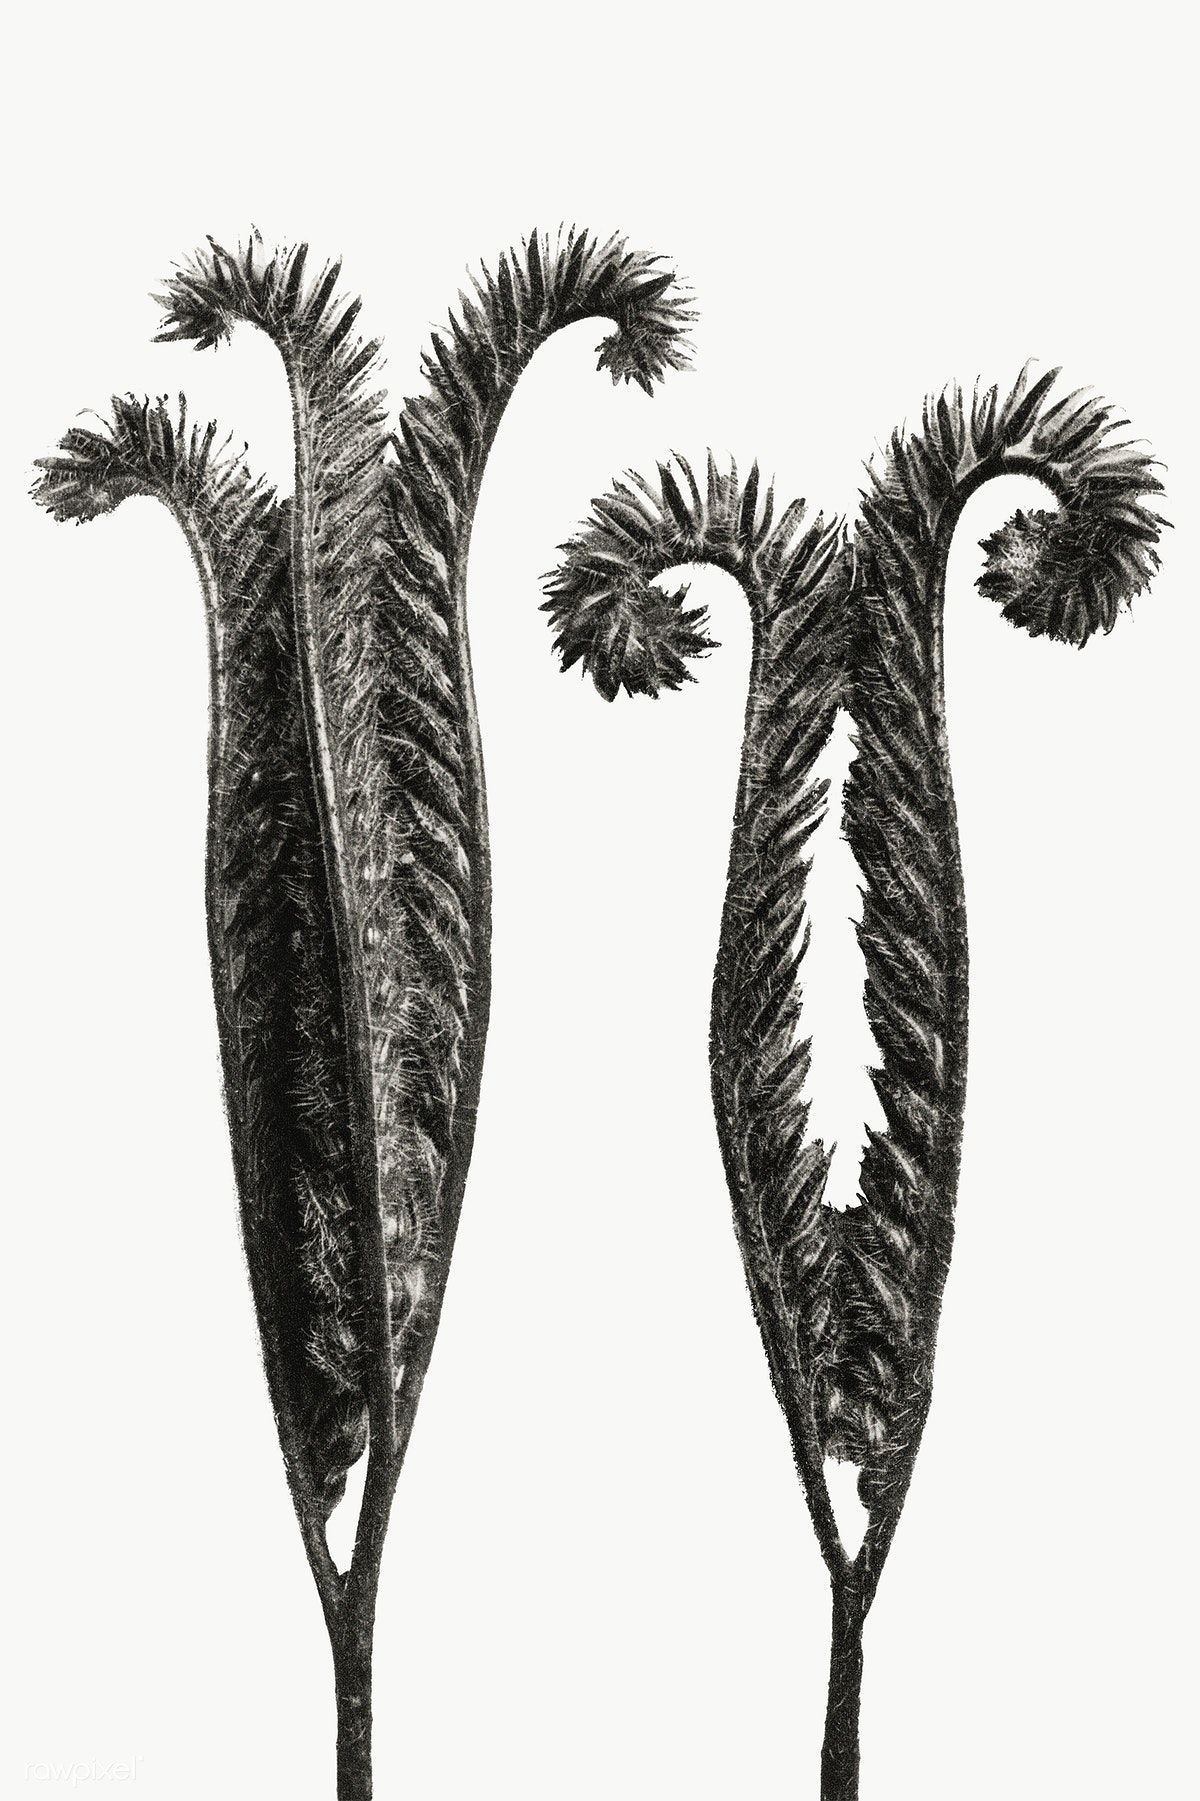 Download premium png of Phacelia Tanacetifolia (Lacy